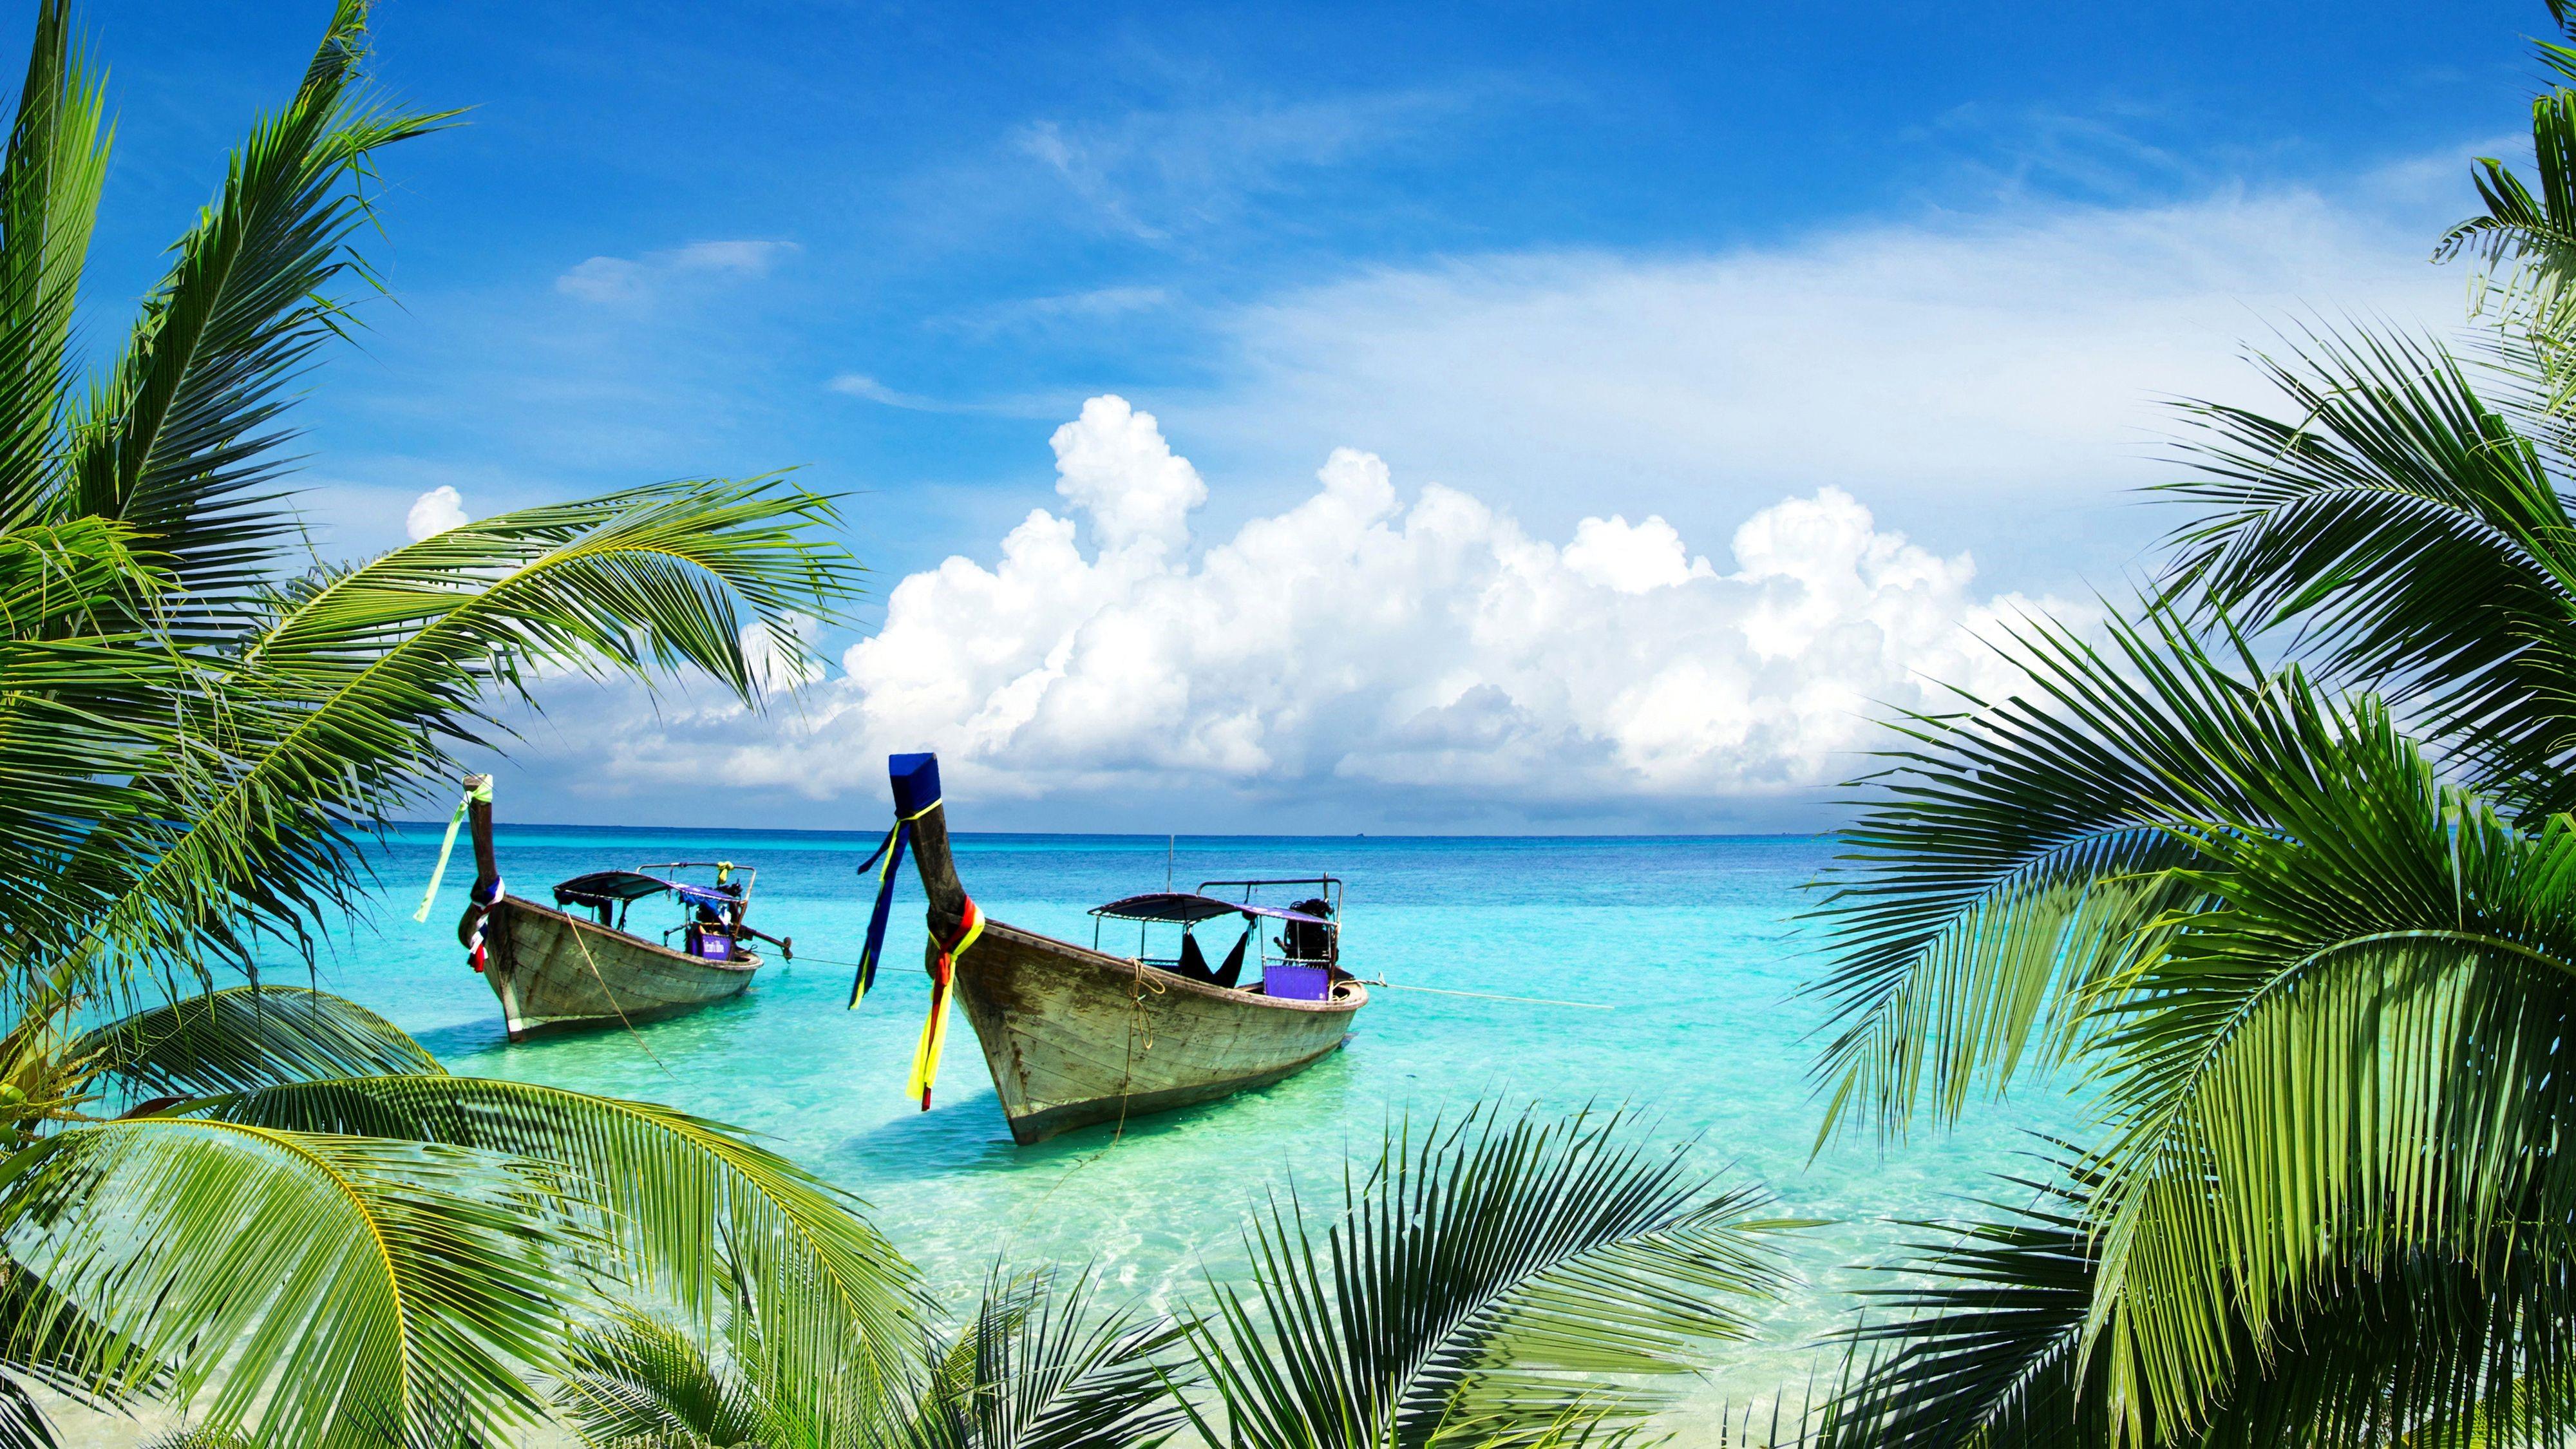 Tropical Beach Landscape UHD Wallpapers